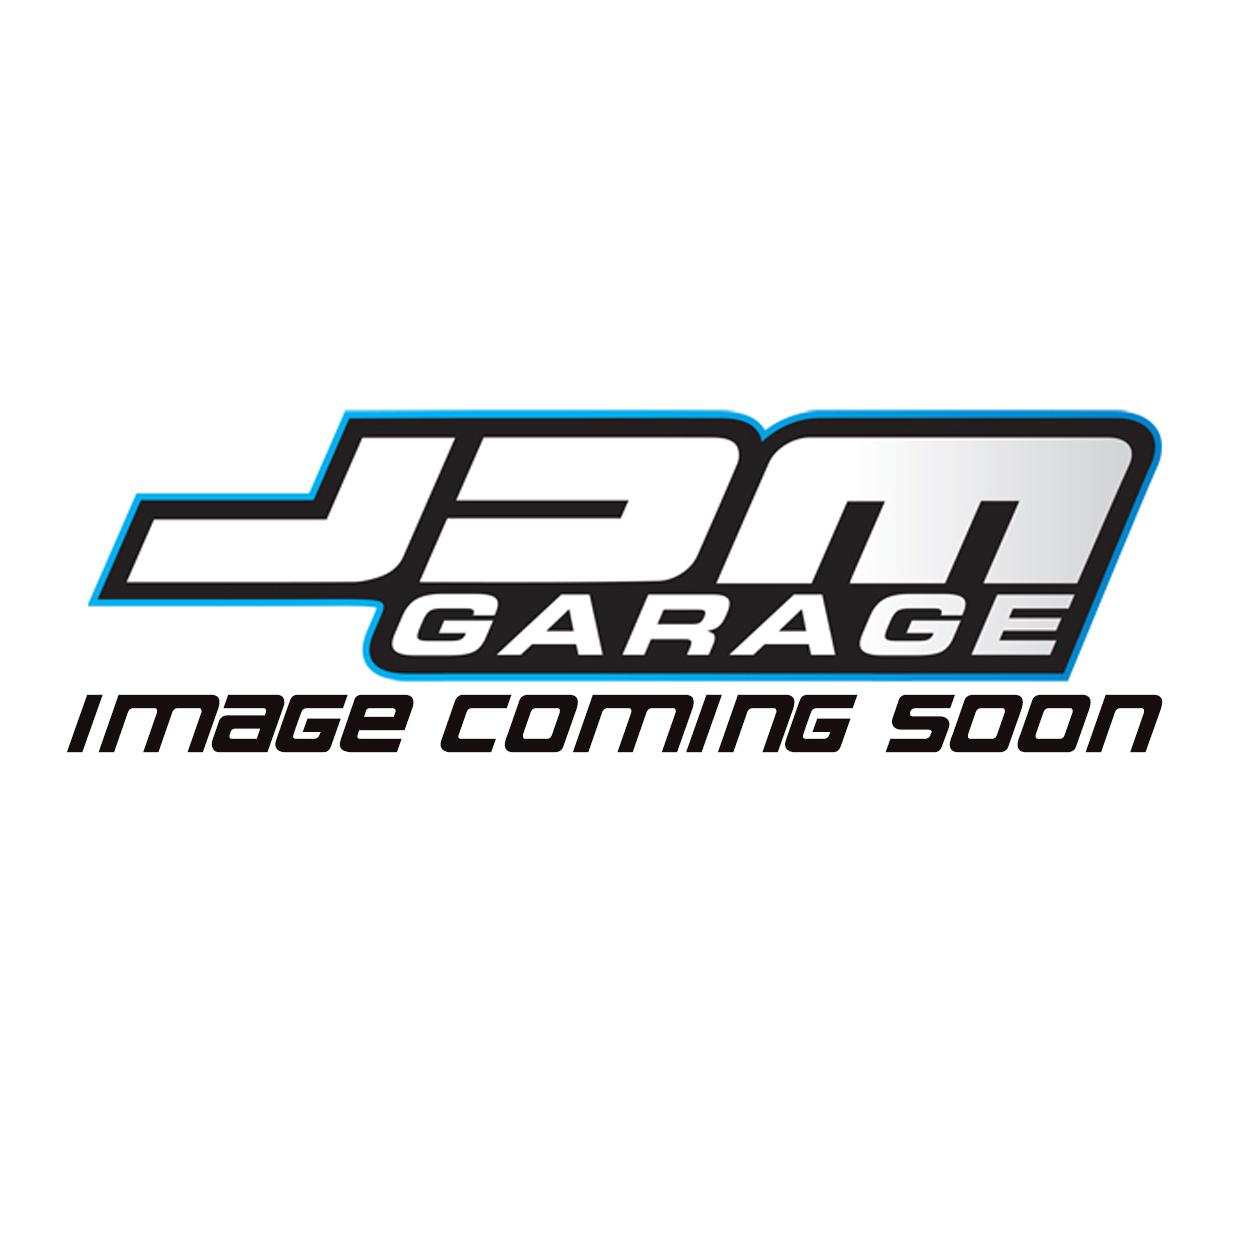 Genuine Nissan Inner Front Hub Oil Seal Fits Nissan Skyline R32 / R33 / R34 GTST GTT 2WD GTR 4WD 40232-33P00